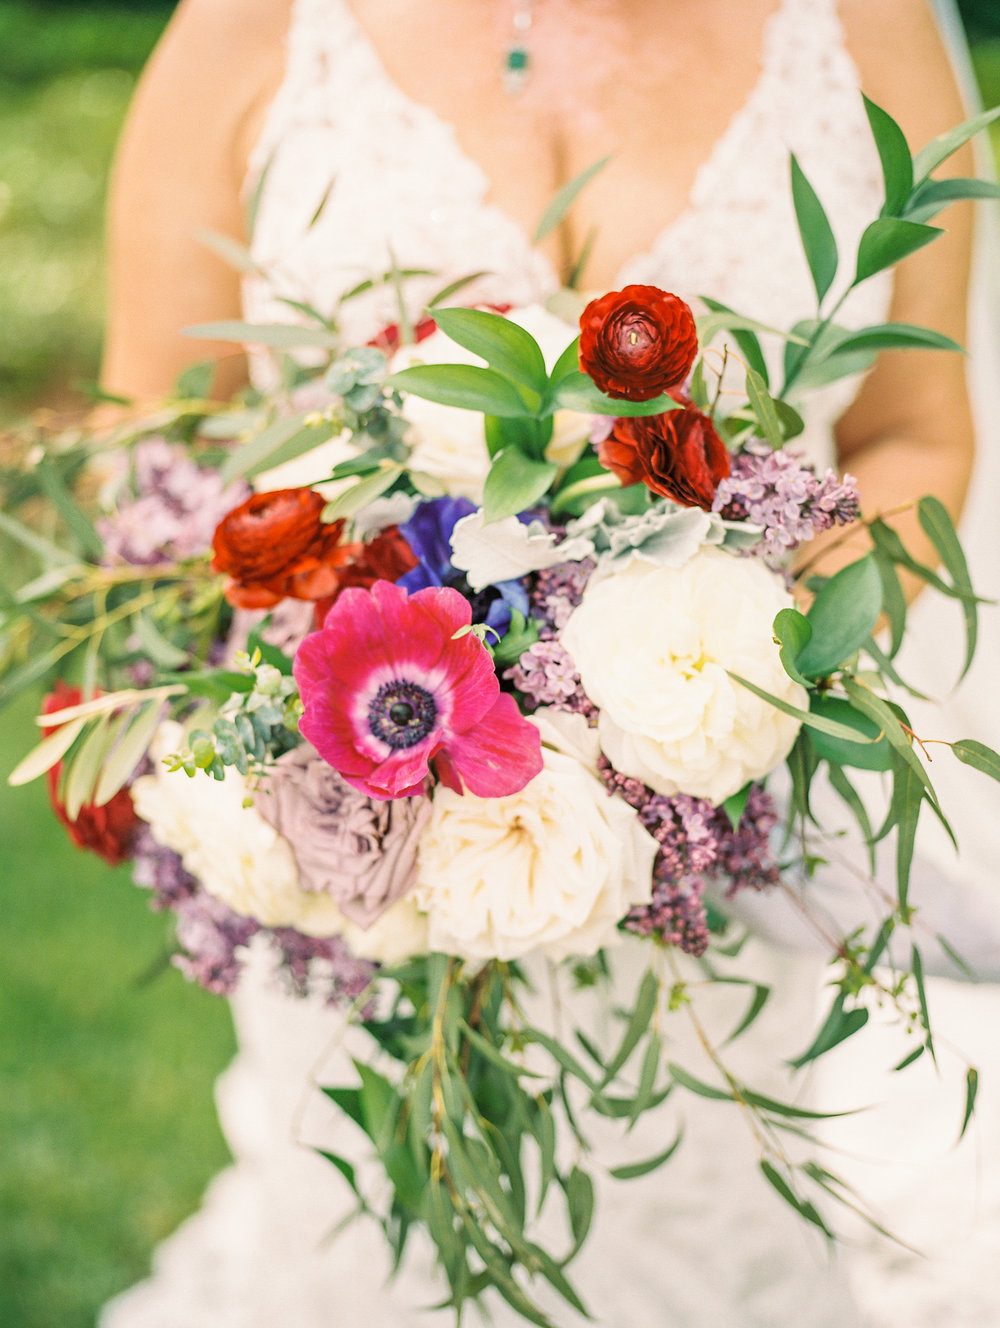 ivory-and-beau-bridal-boutique-jim-and-melanie-marianne-lucille-photography-oldfield-plantation-wedding-beautfort-inn-wedding-9.jpg